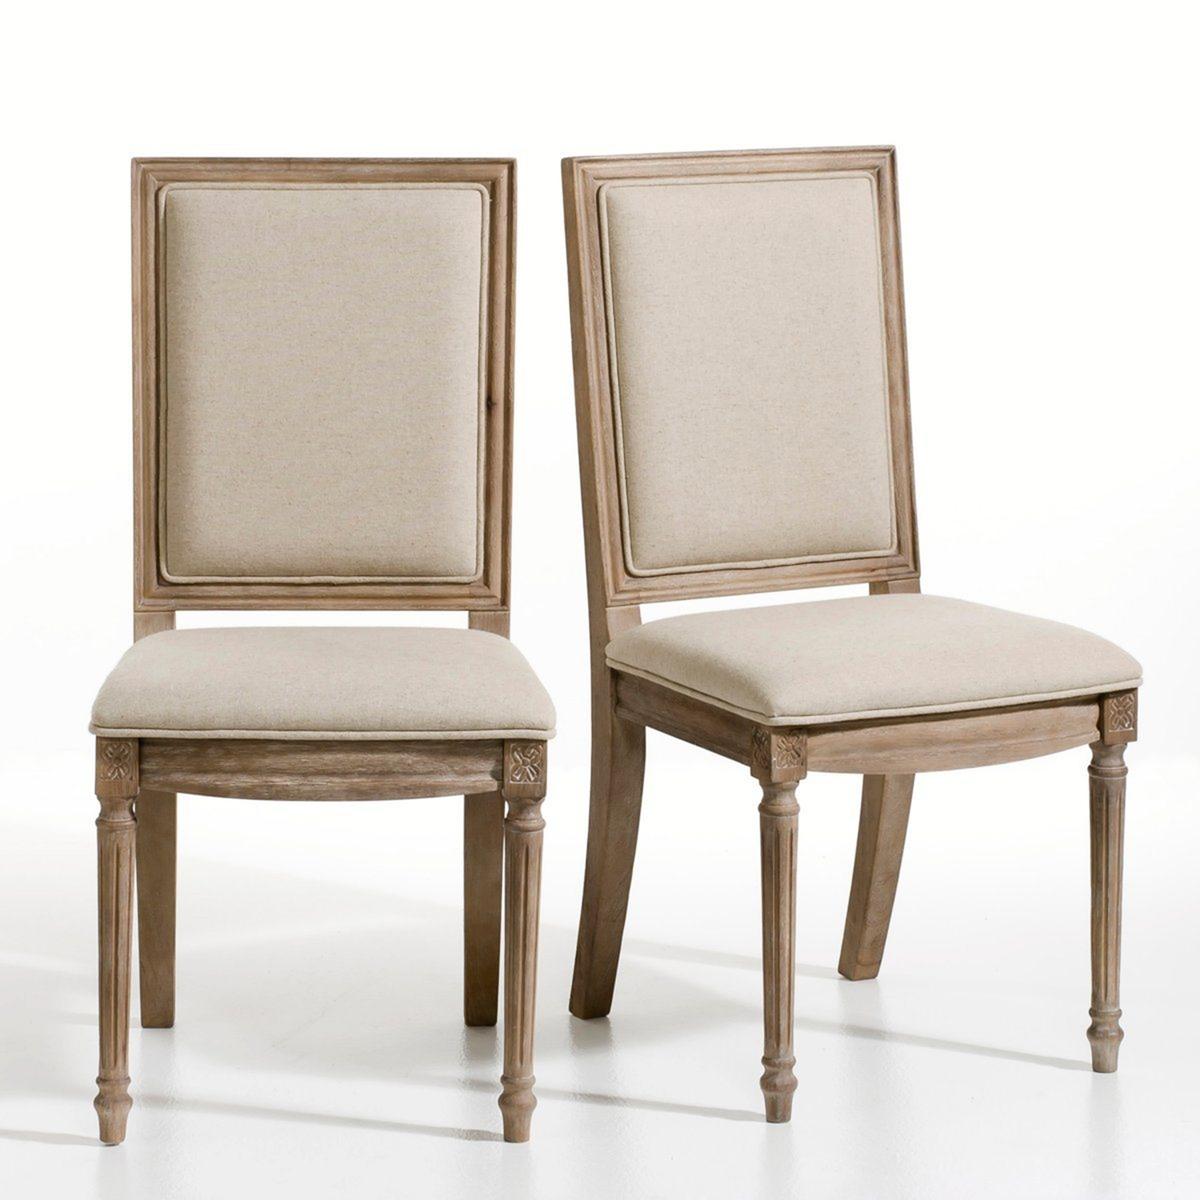 2 стула в стиле Людовика XVI, Nottingham цены онлайн